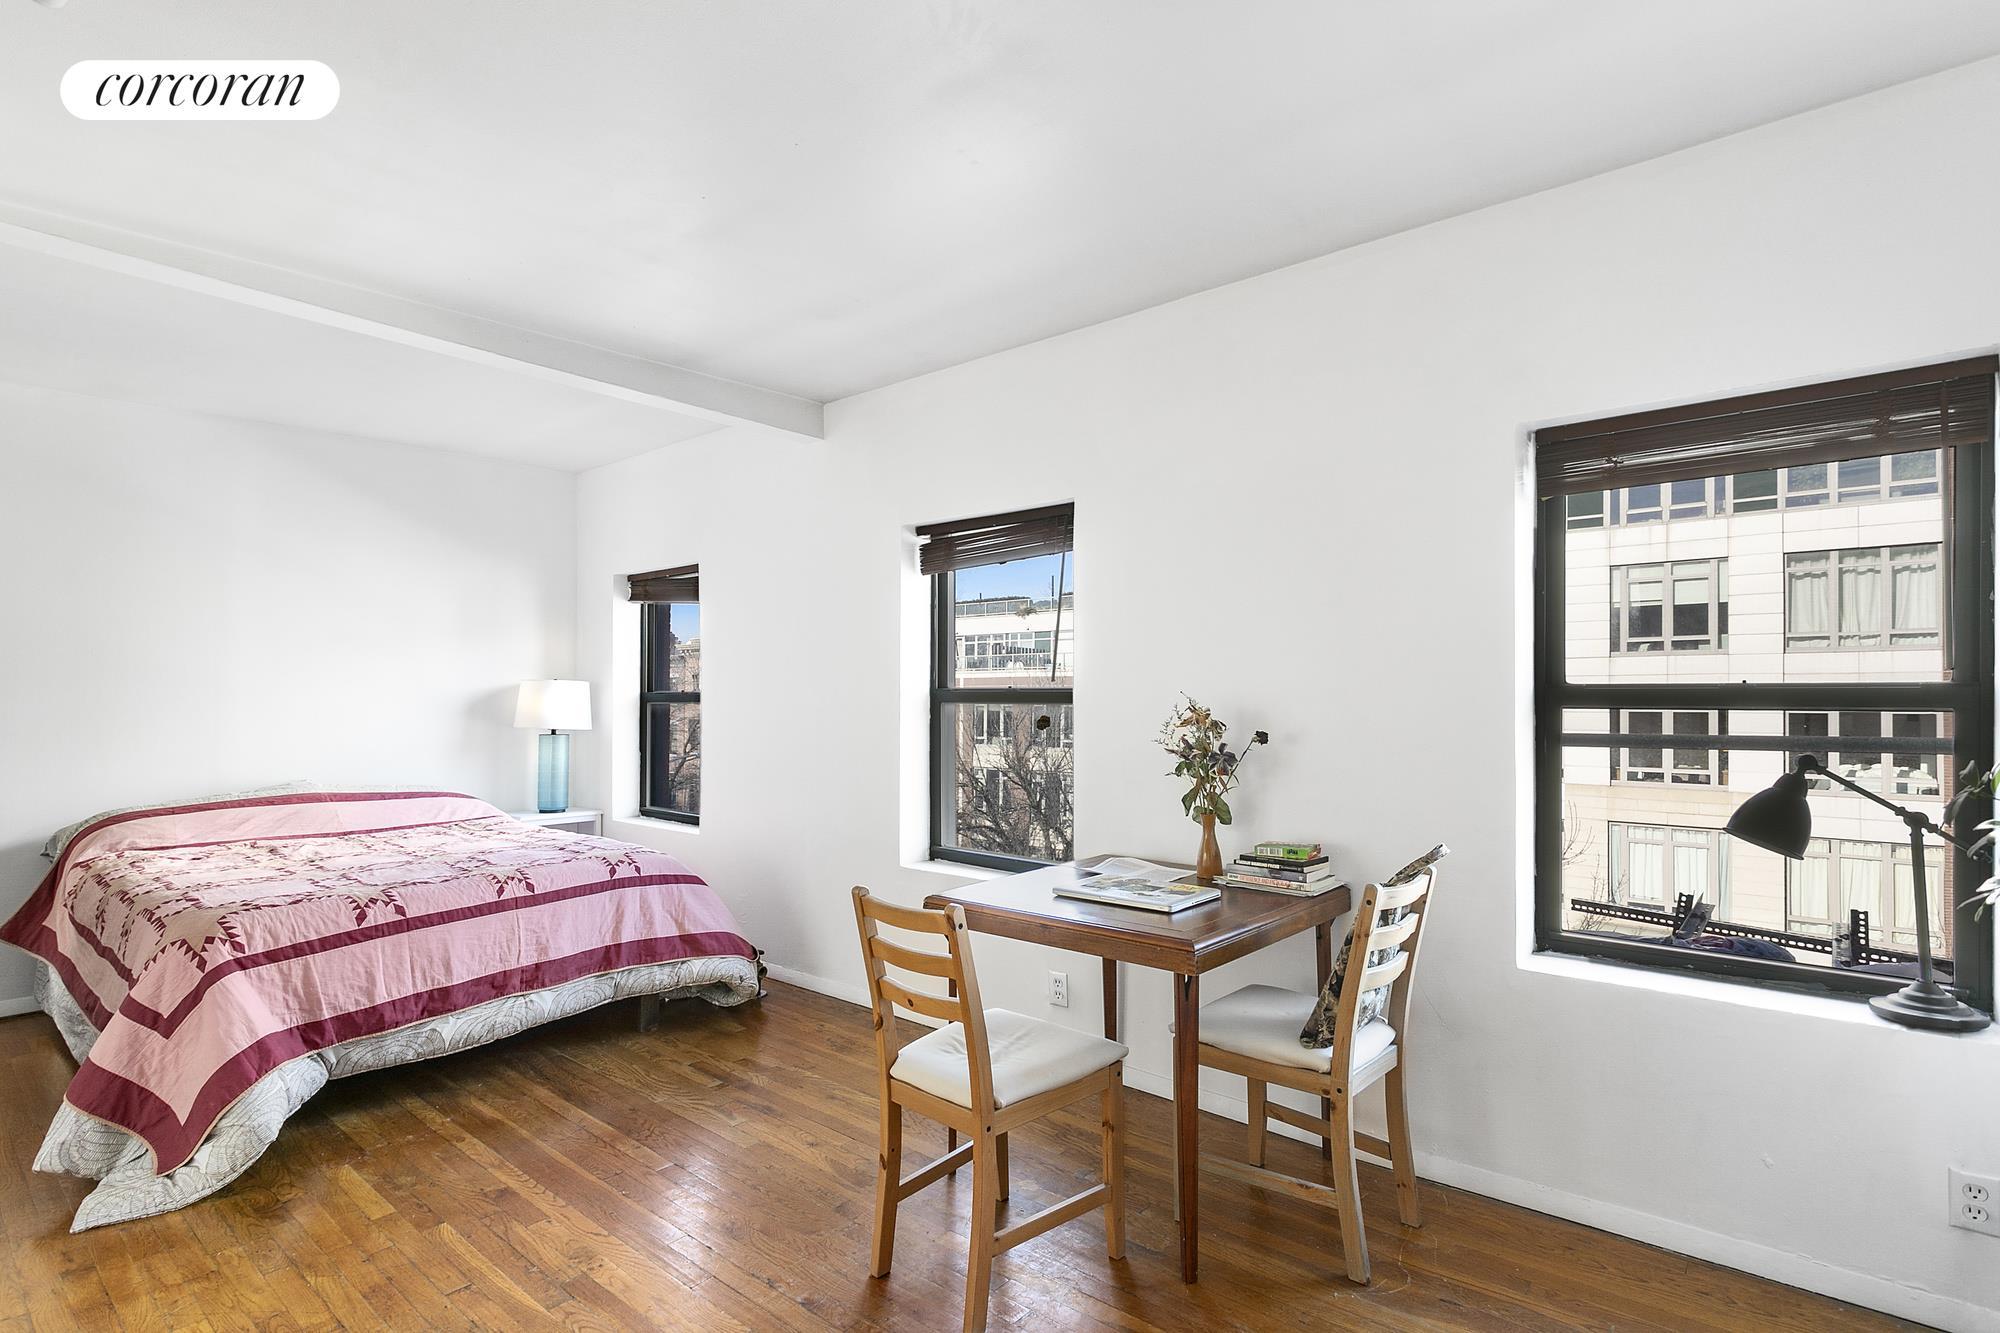 306 Gates Avenue Bedford Stuyvesant Brooklyn NY 11216